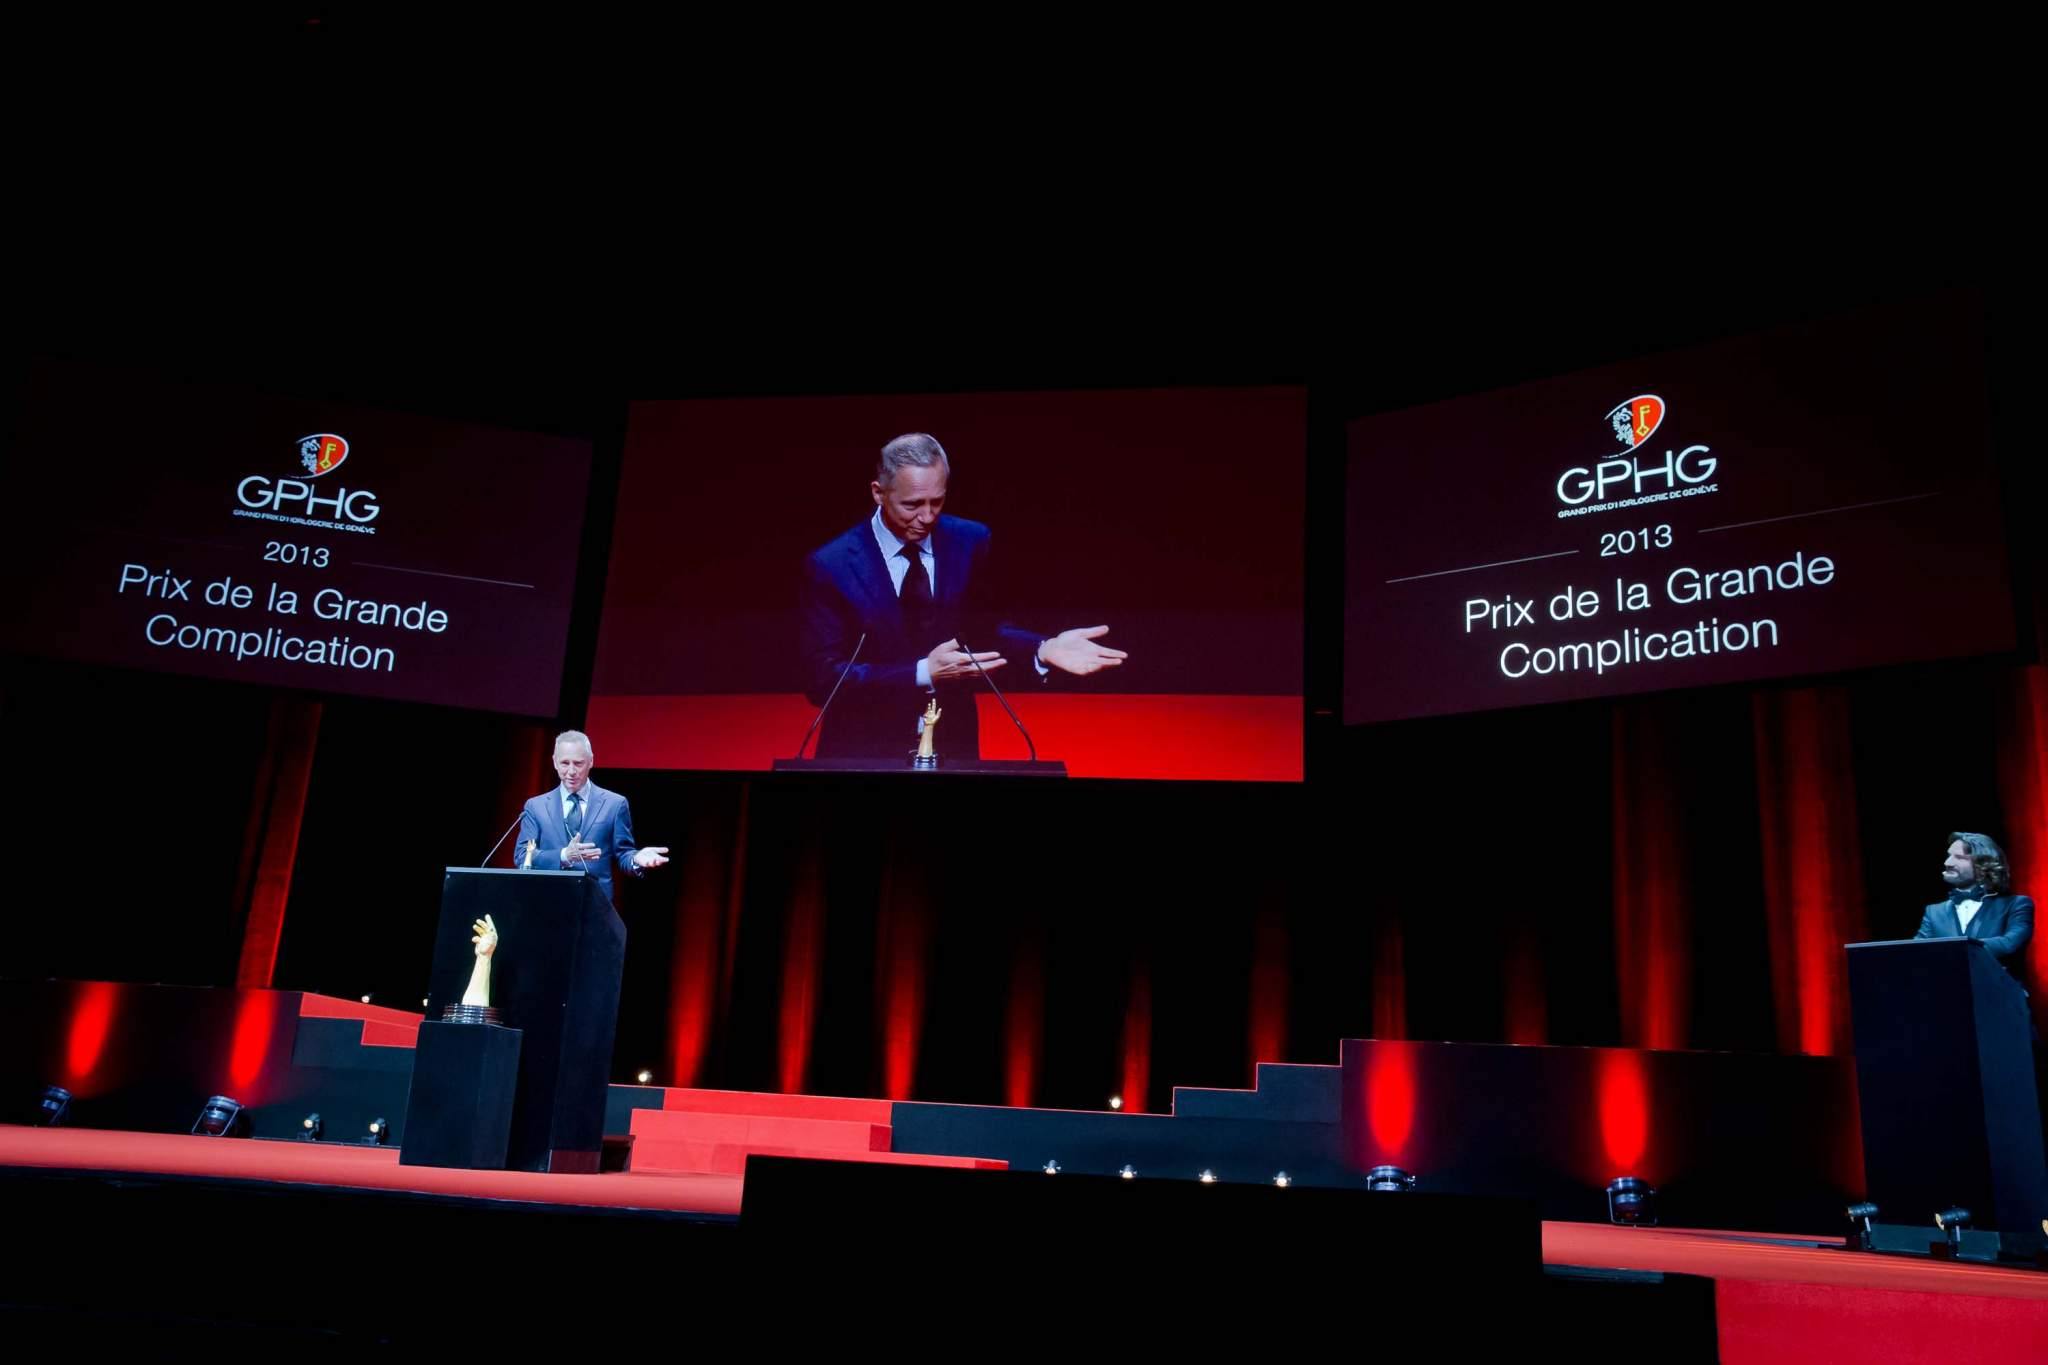 Speech of Wilhelm Schmid, CEO of A. Lange & Söhne, winner of Grande Complication Prize 2013